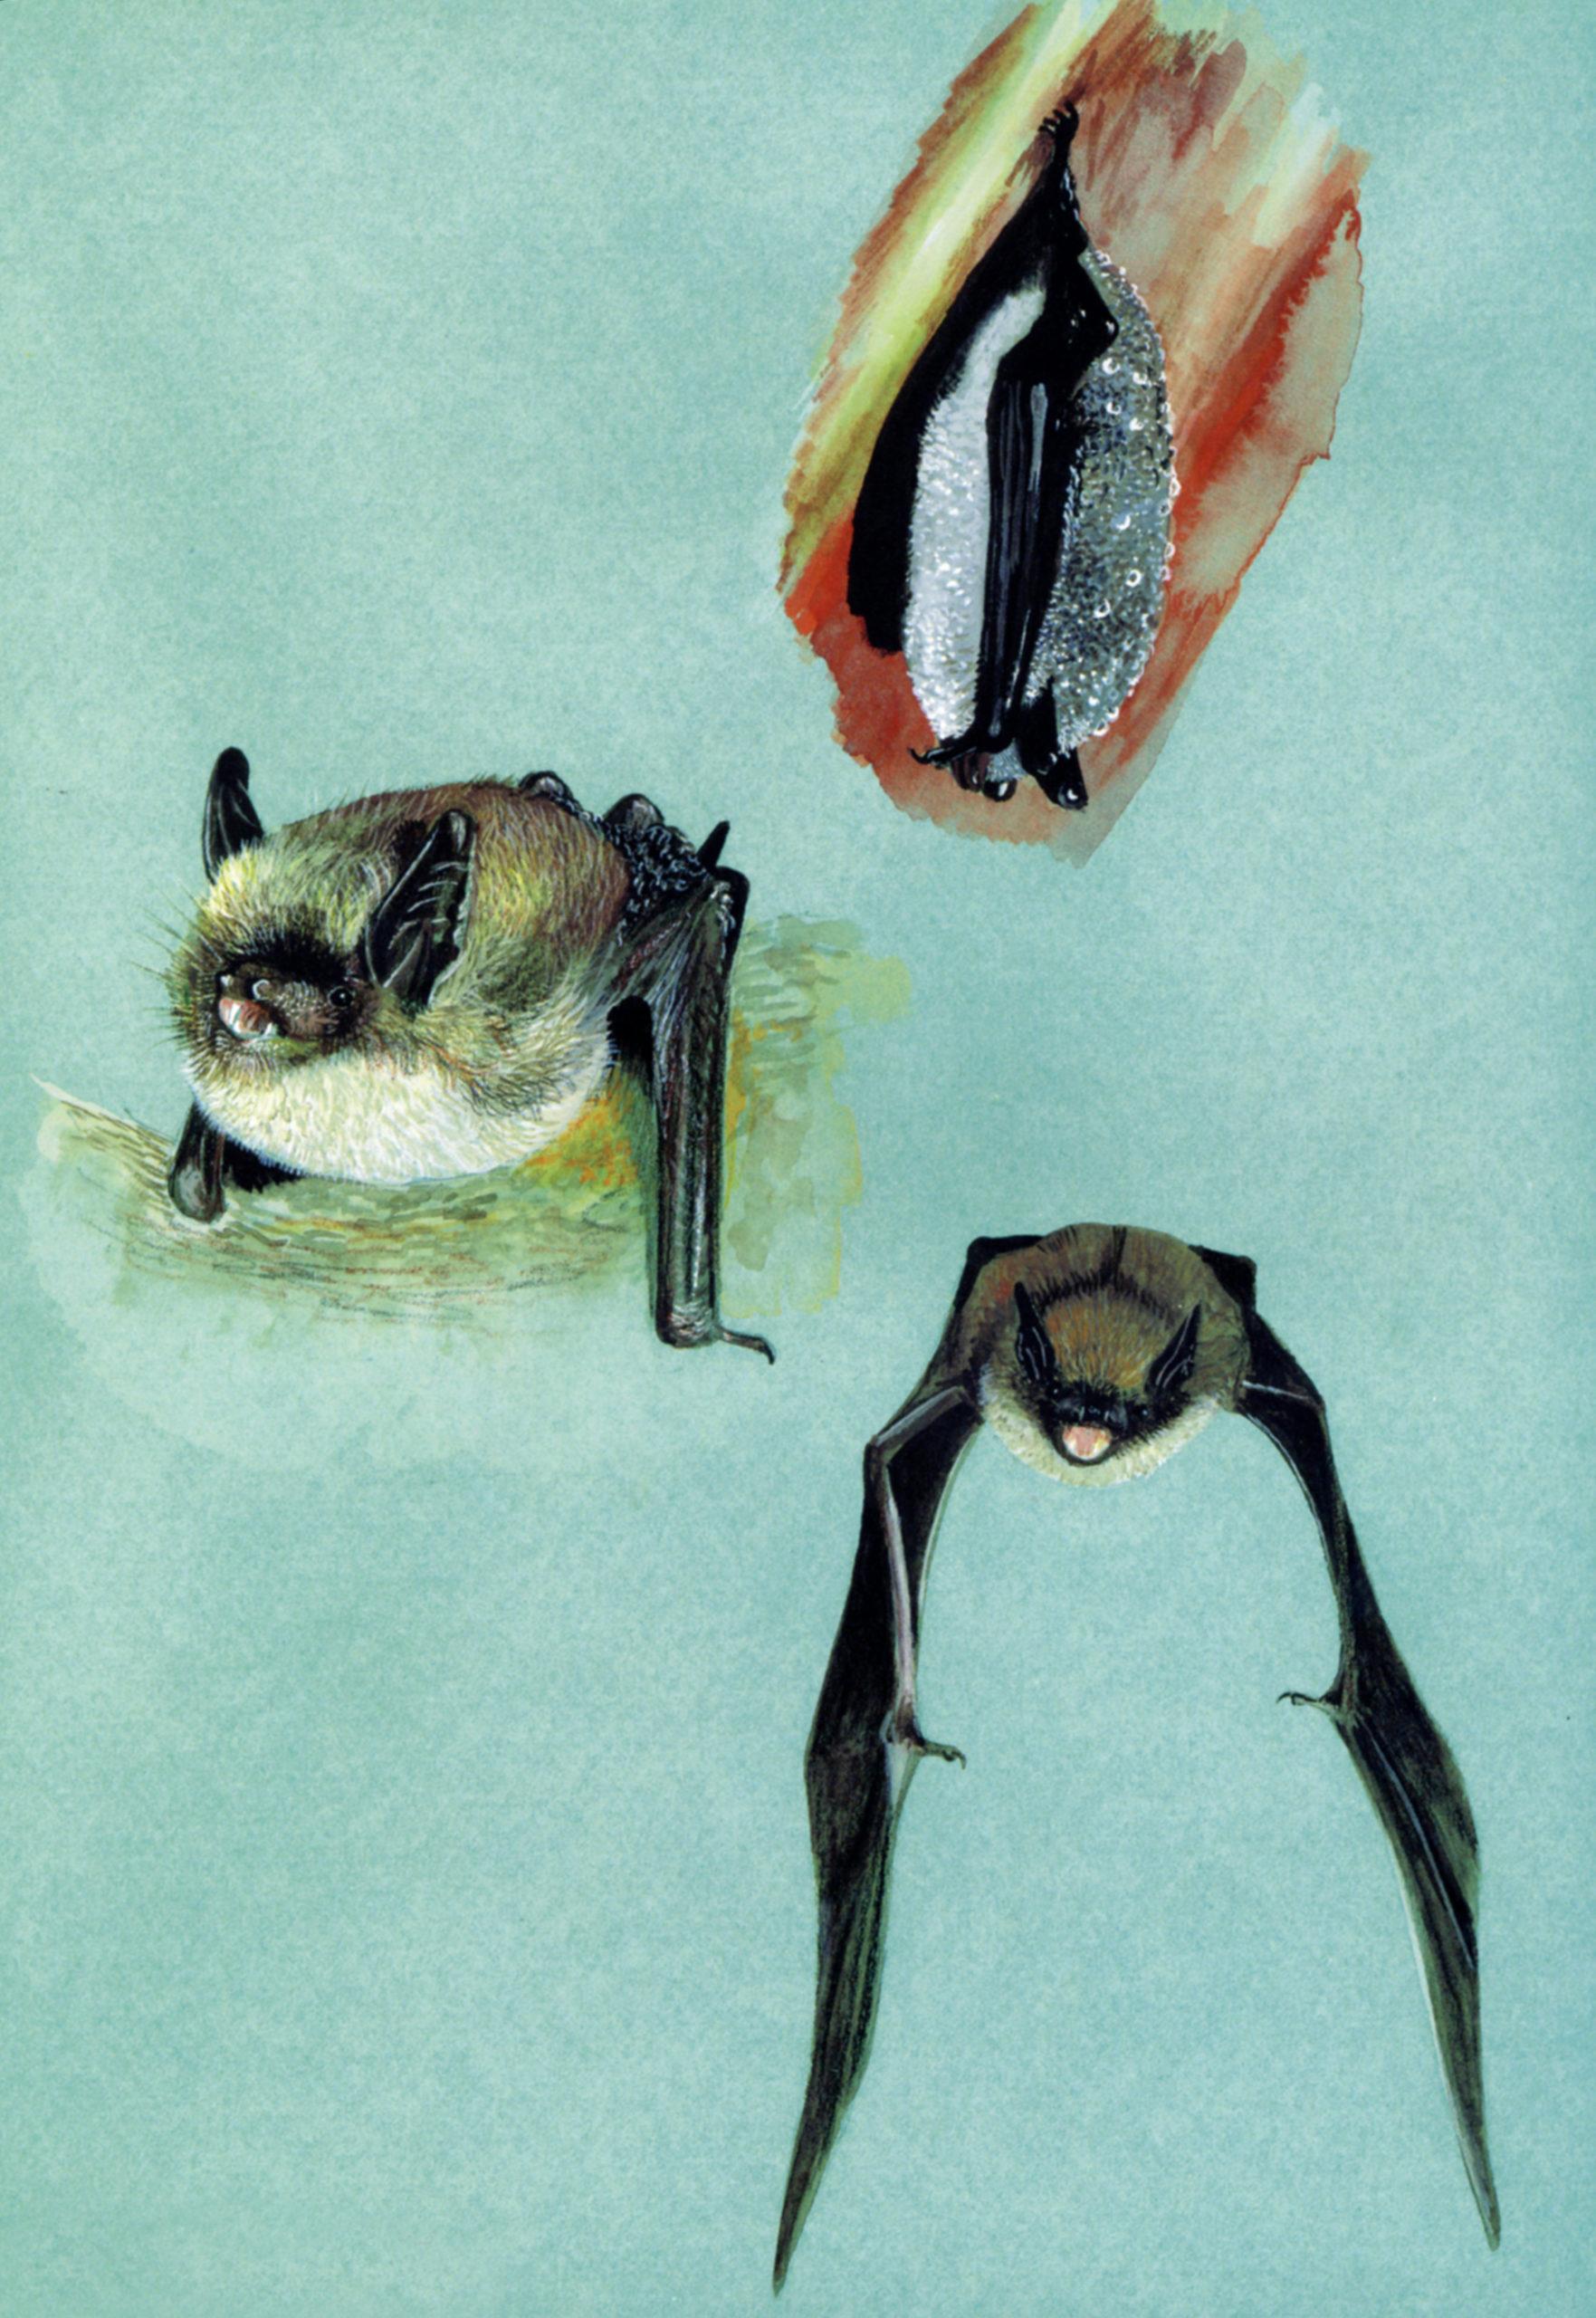 Vespertilio mustacchino (Myotis mystacinus)